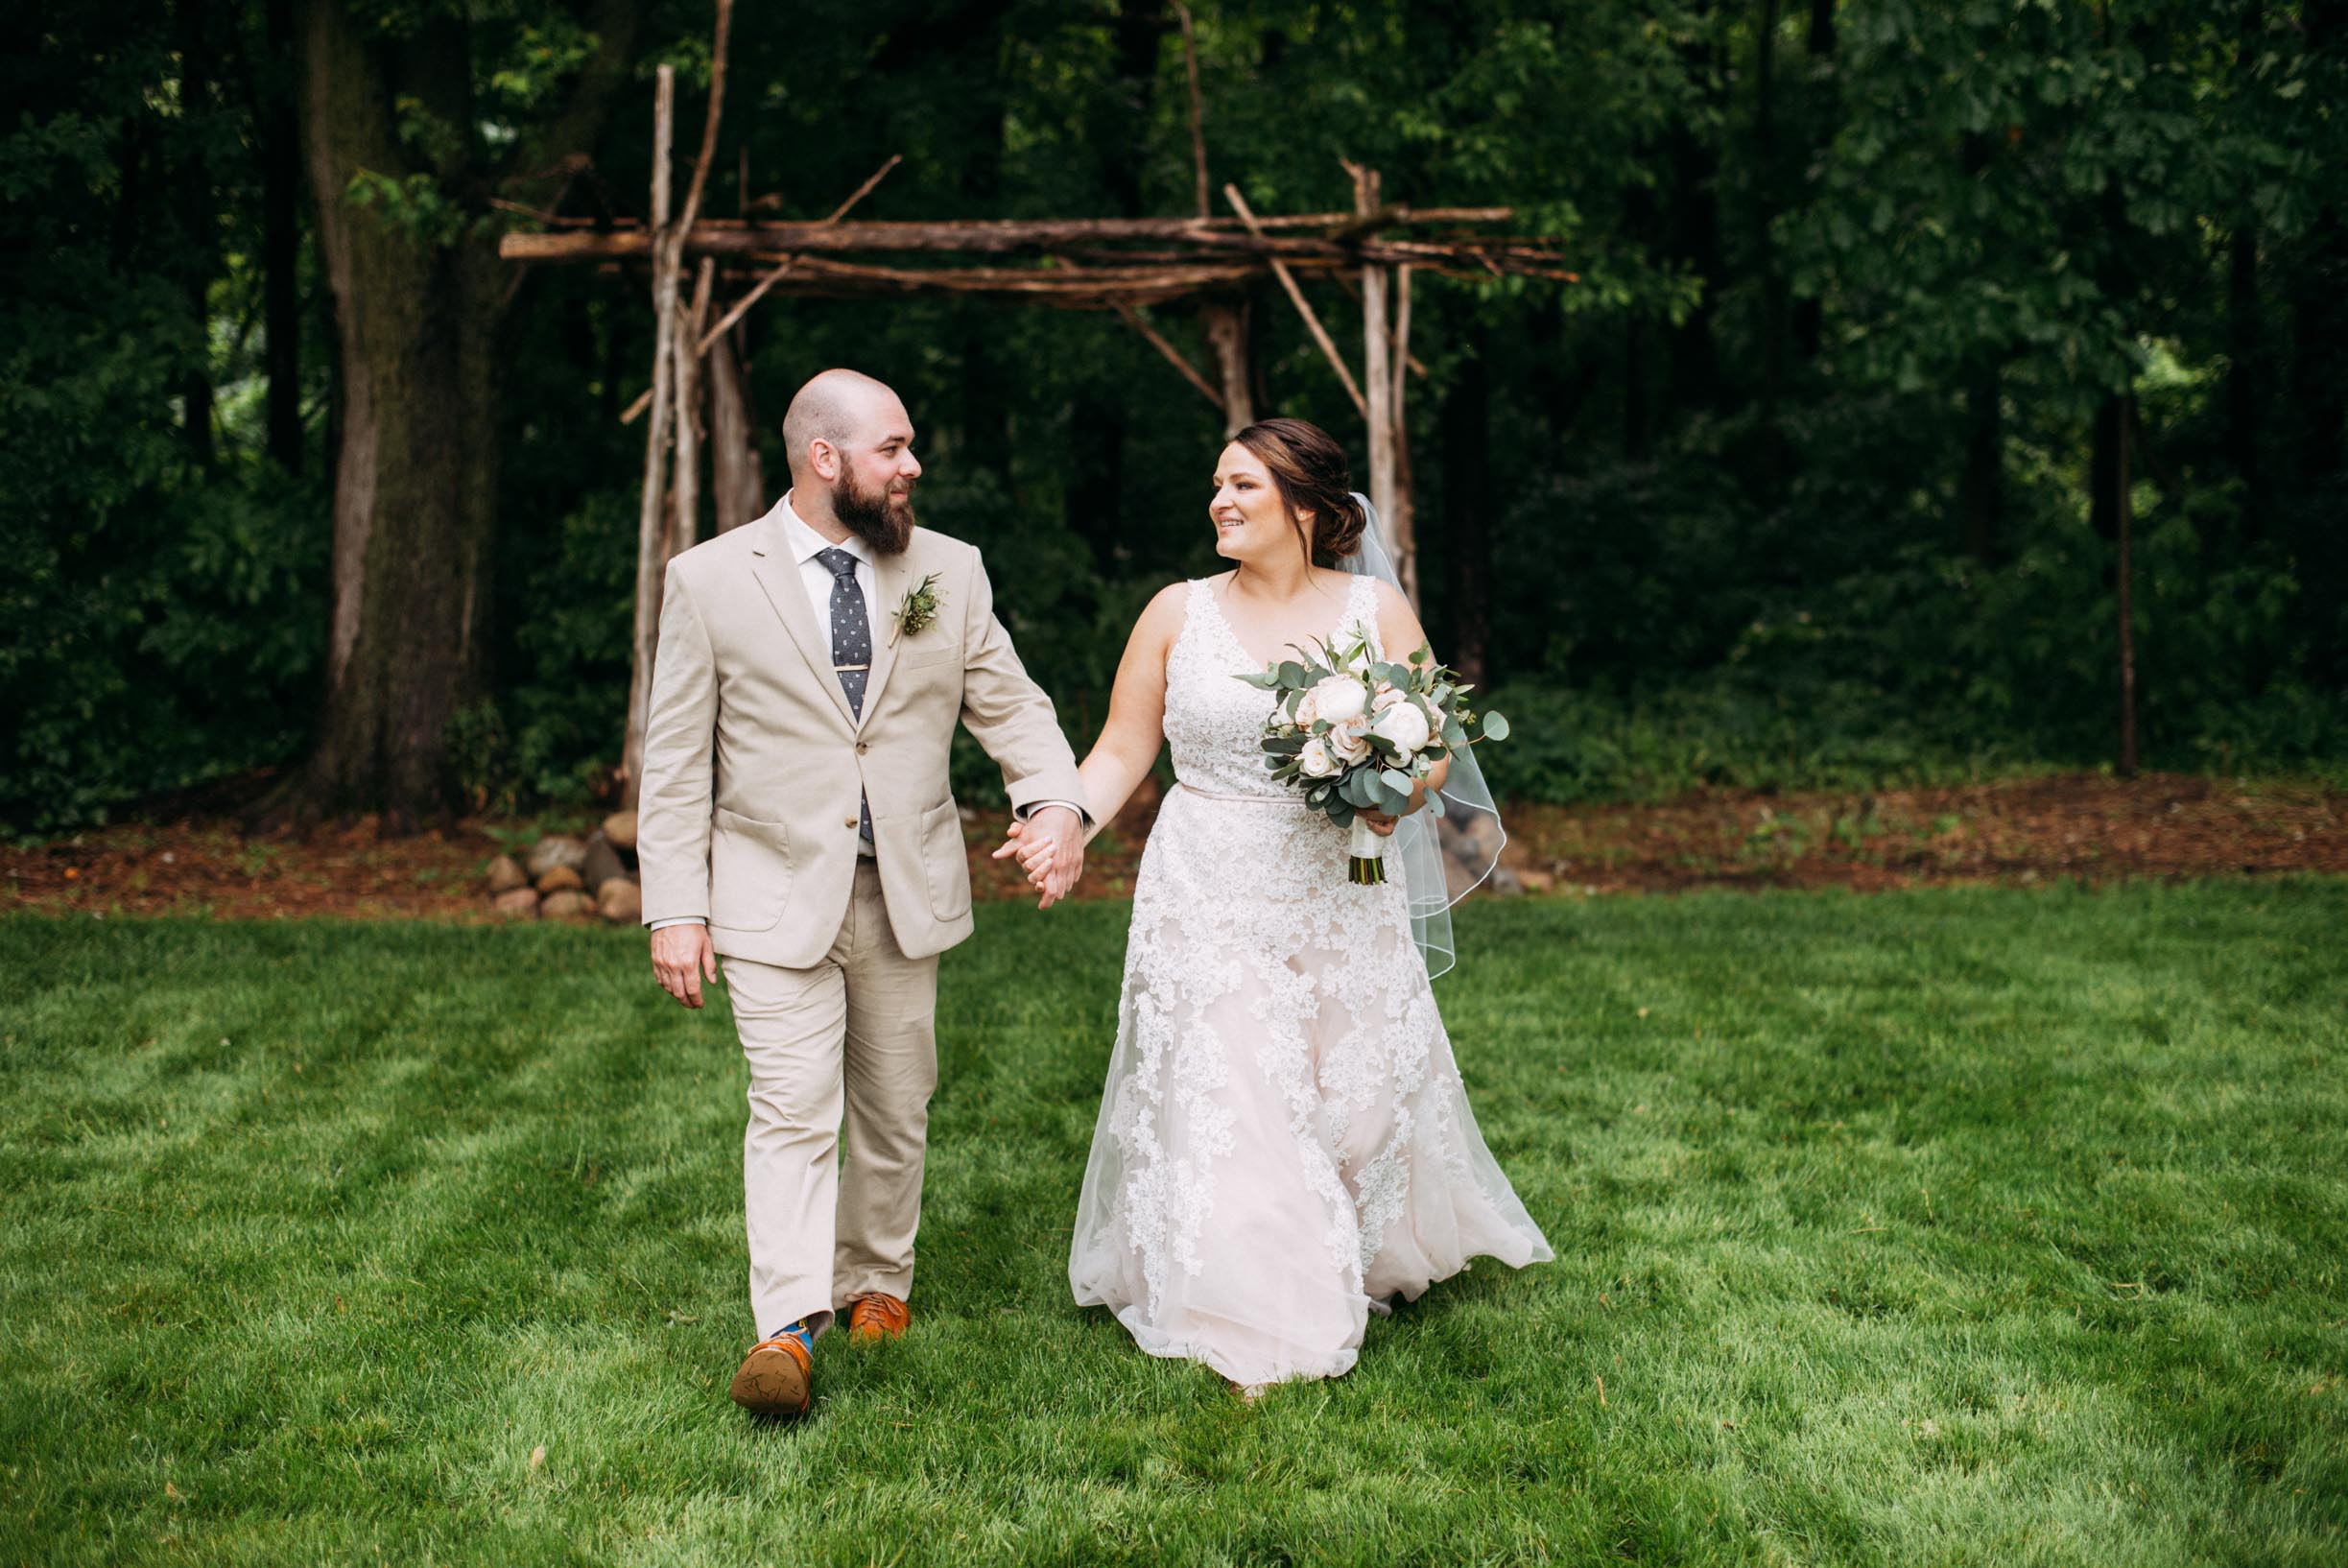 28-Jess_Jeremy_Minnesota_Wedding.jpg